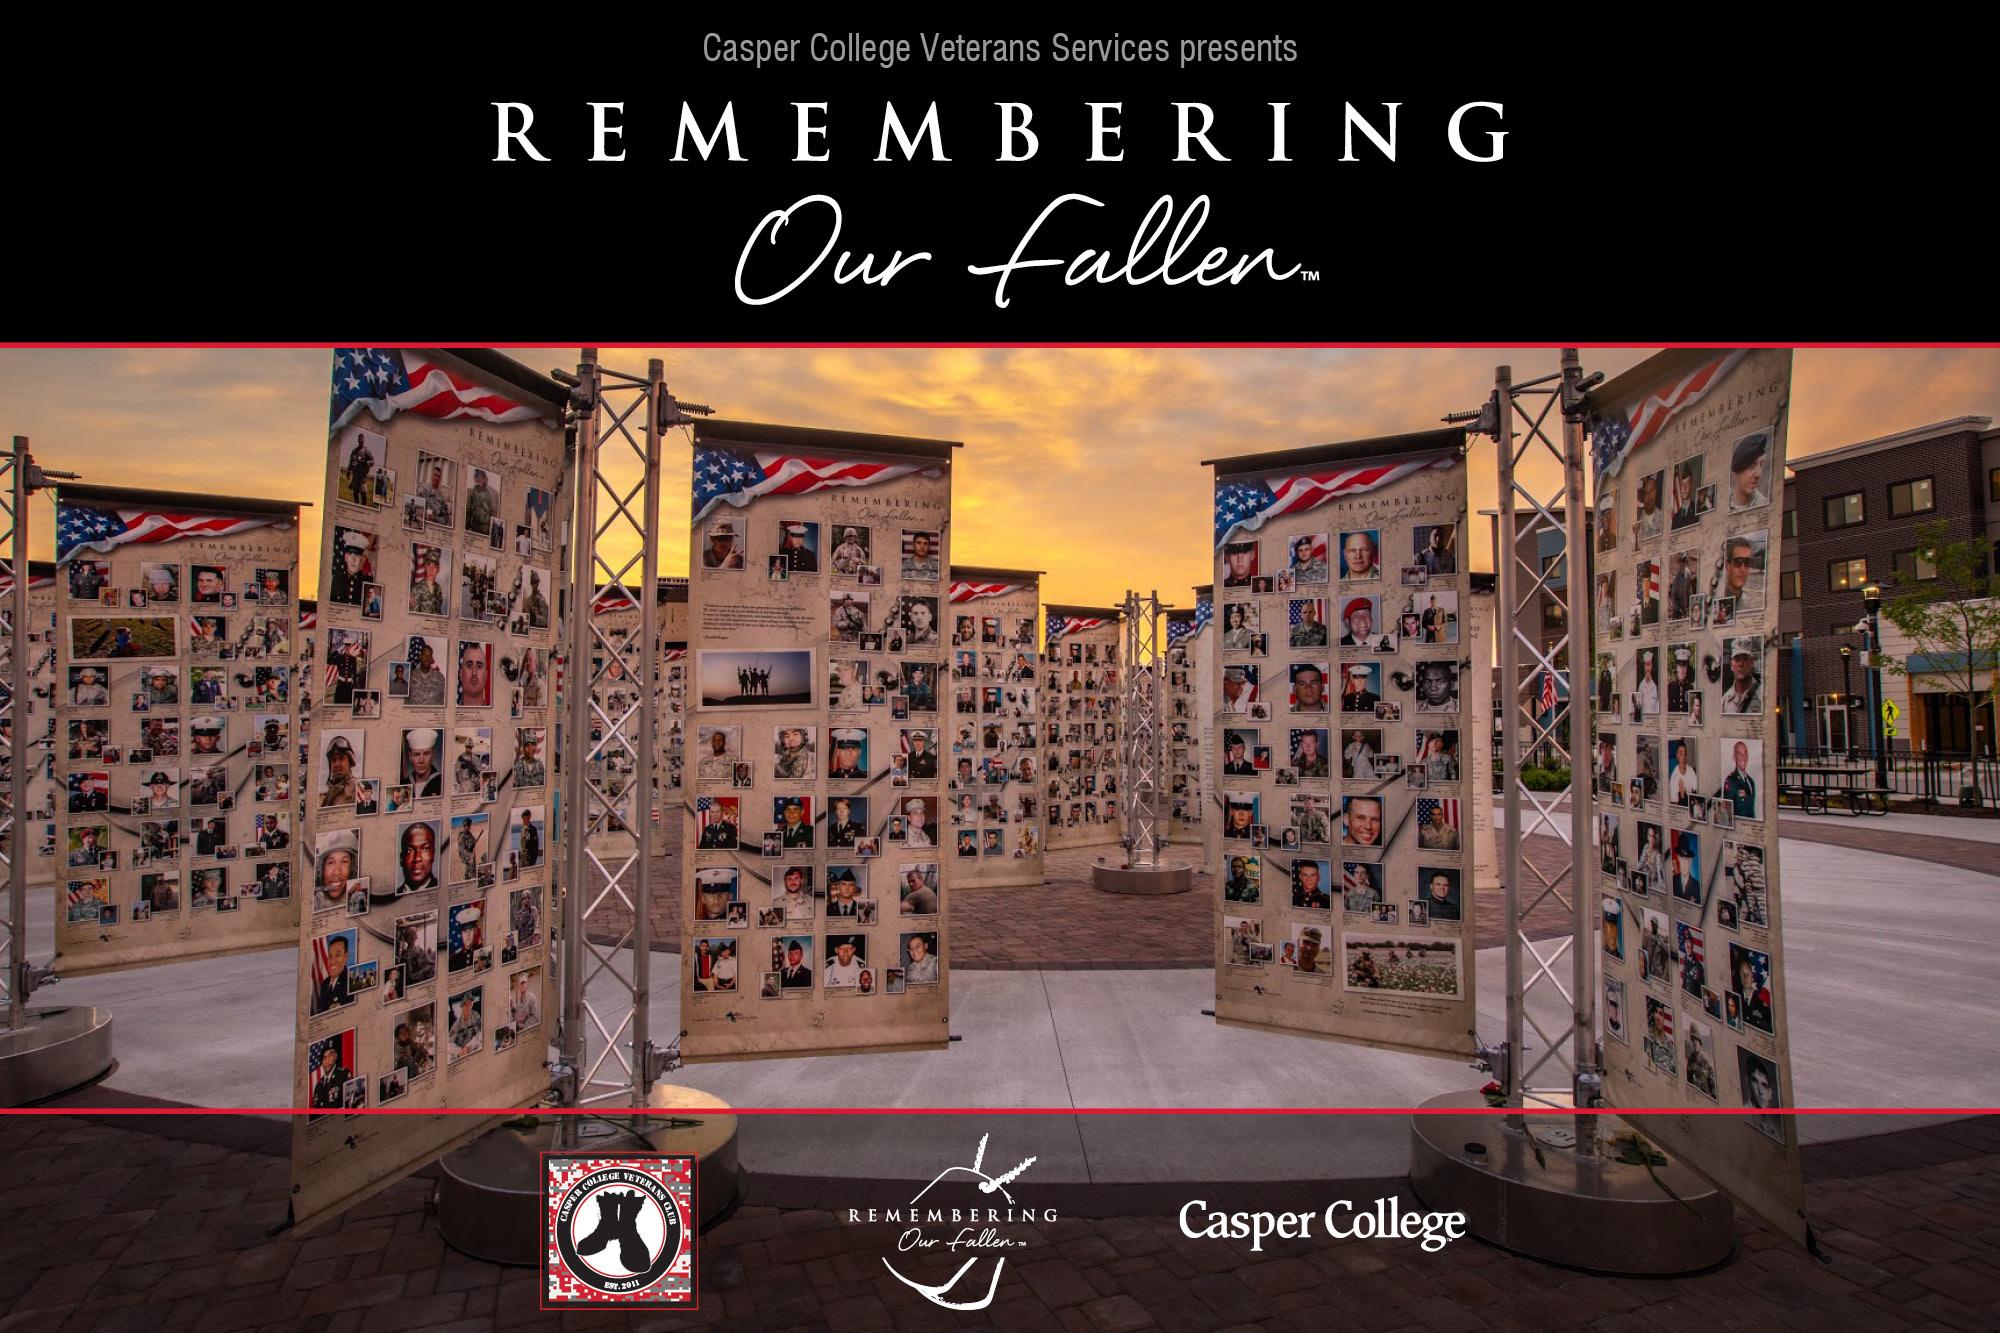 Image for the Fallen Heroes Memorial.